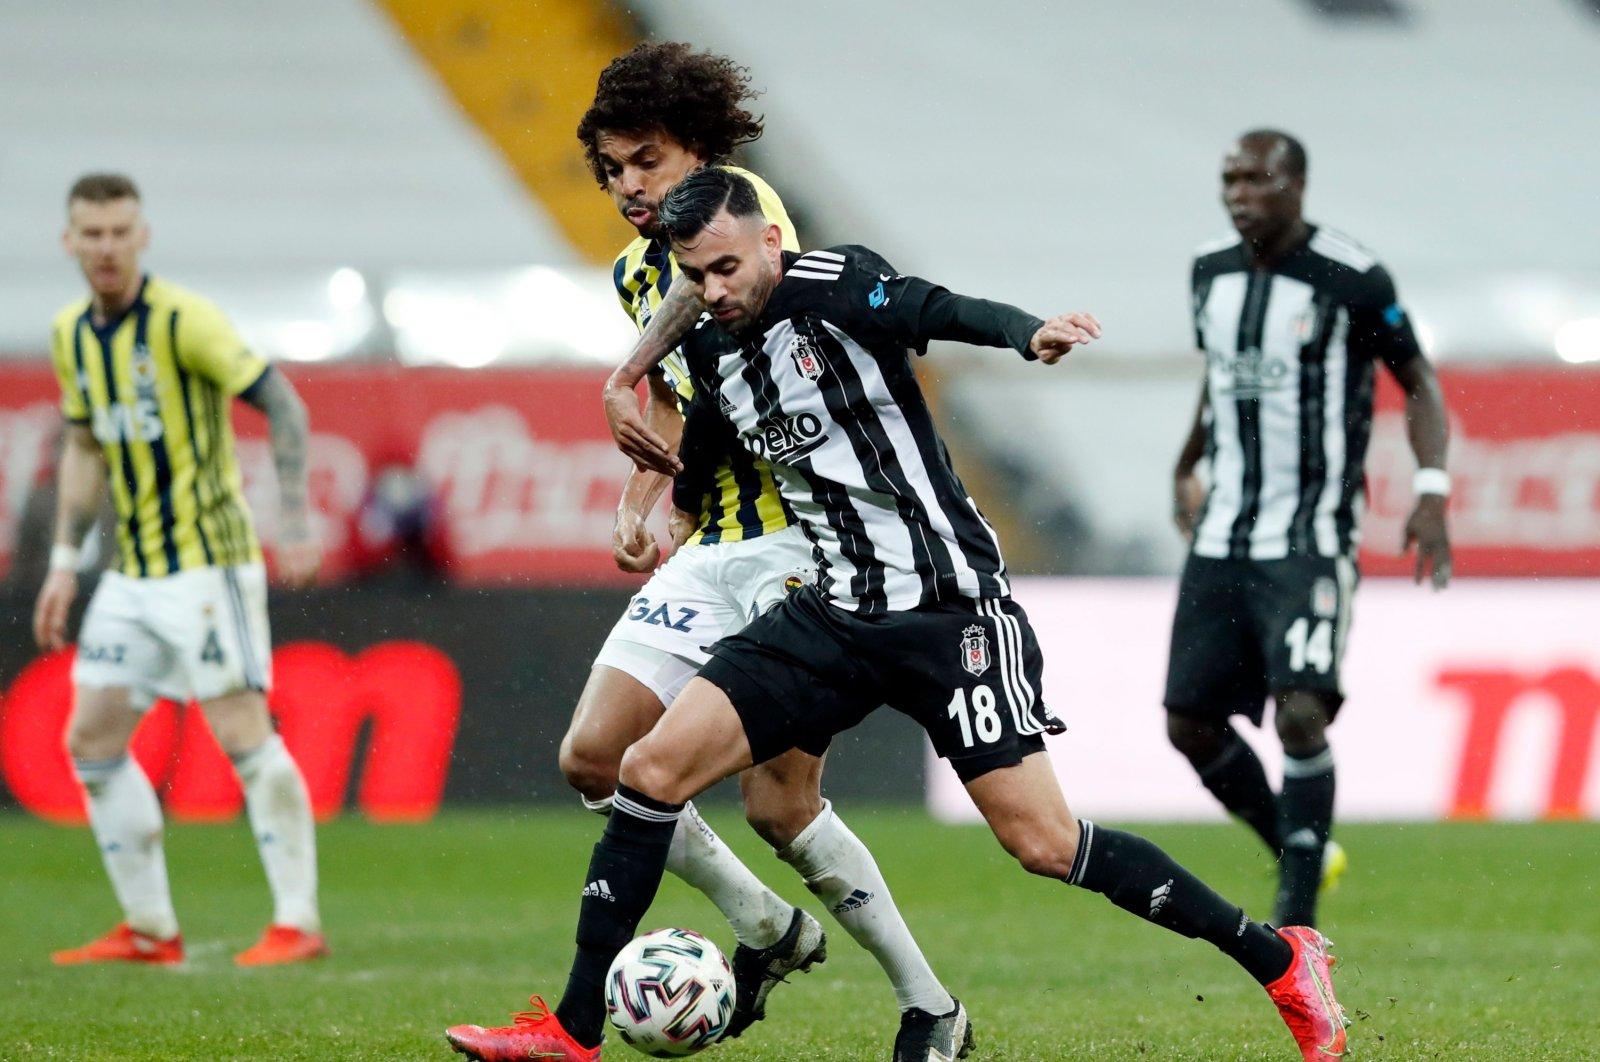 Beşiktaş's Rachid Ghezzal in action with Fenerbahçe's Luiz Gustavo on March 21, 2021. (Reuters Photo)